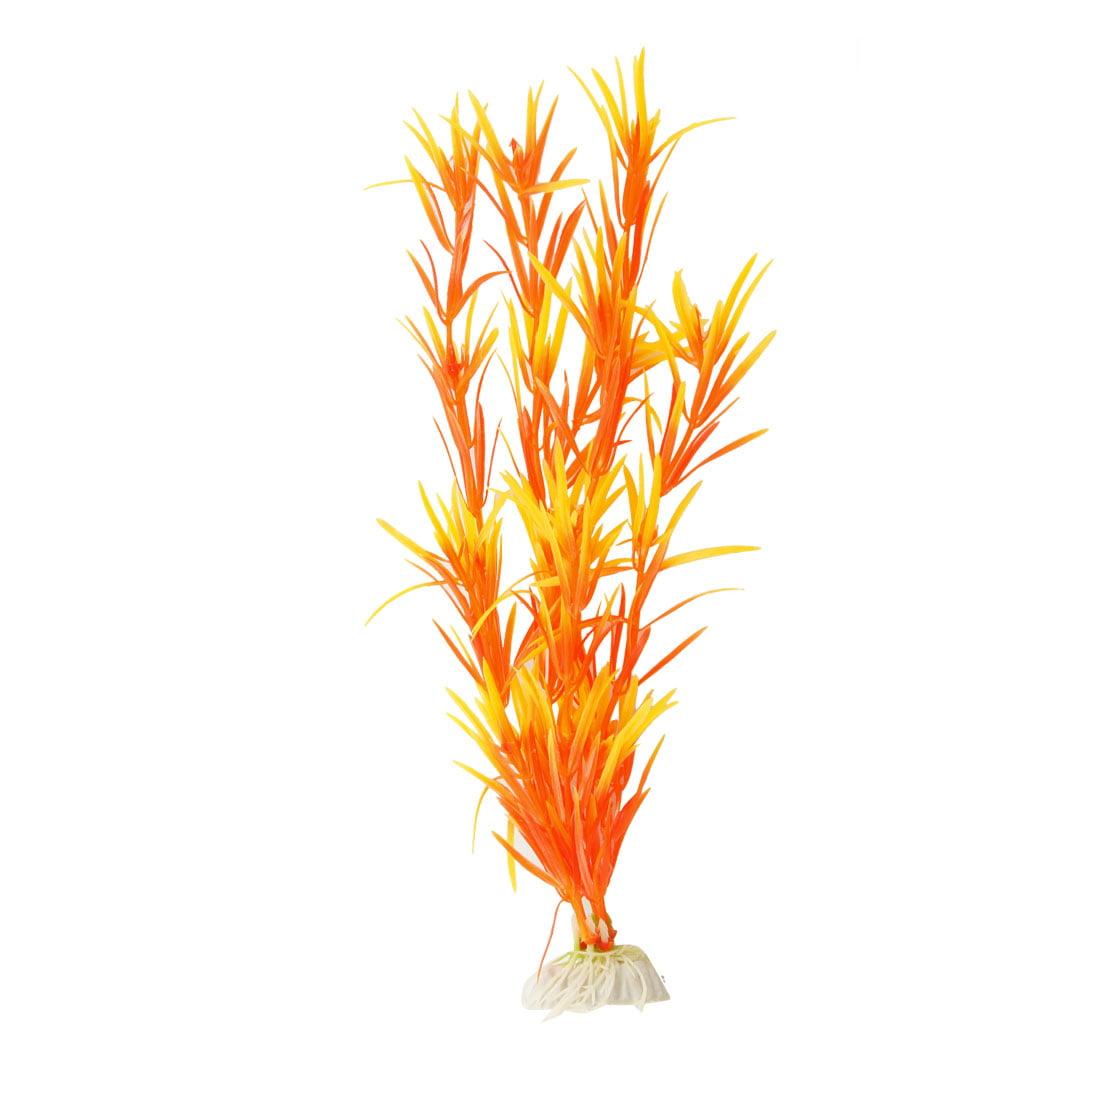 Unique Bargains Unique Bargains Aquarium Decor Artificial Orange Yellow Plant Grass Ornament